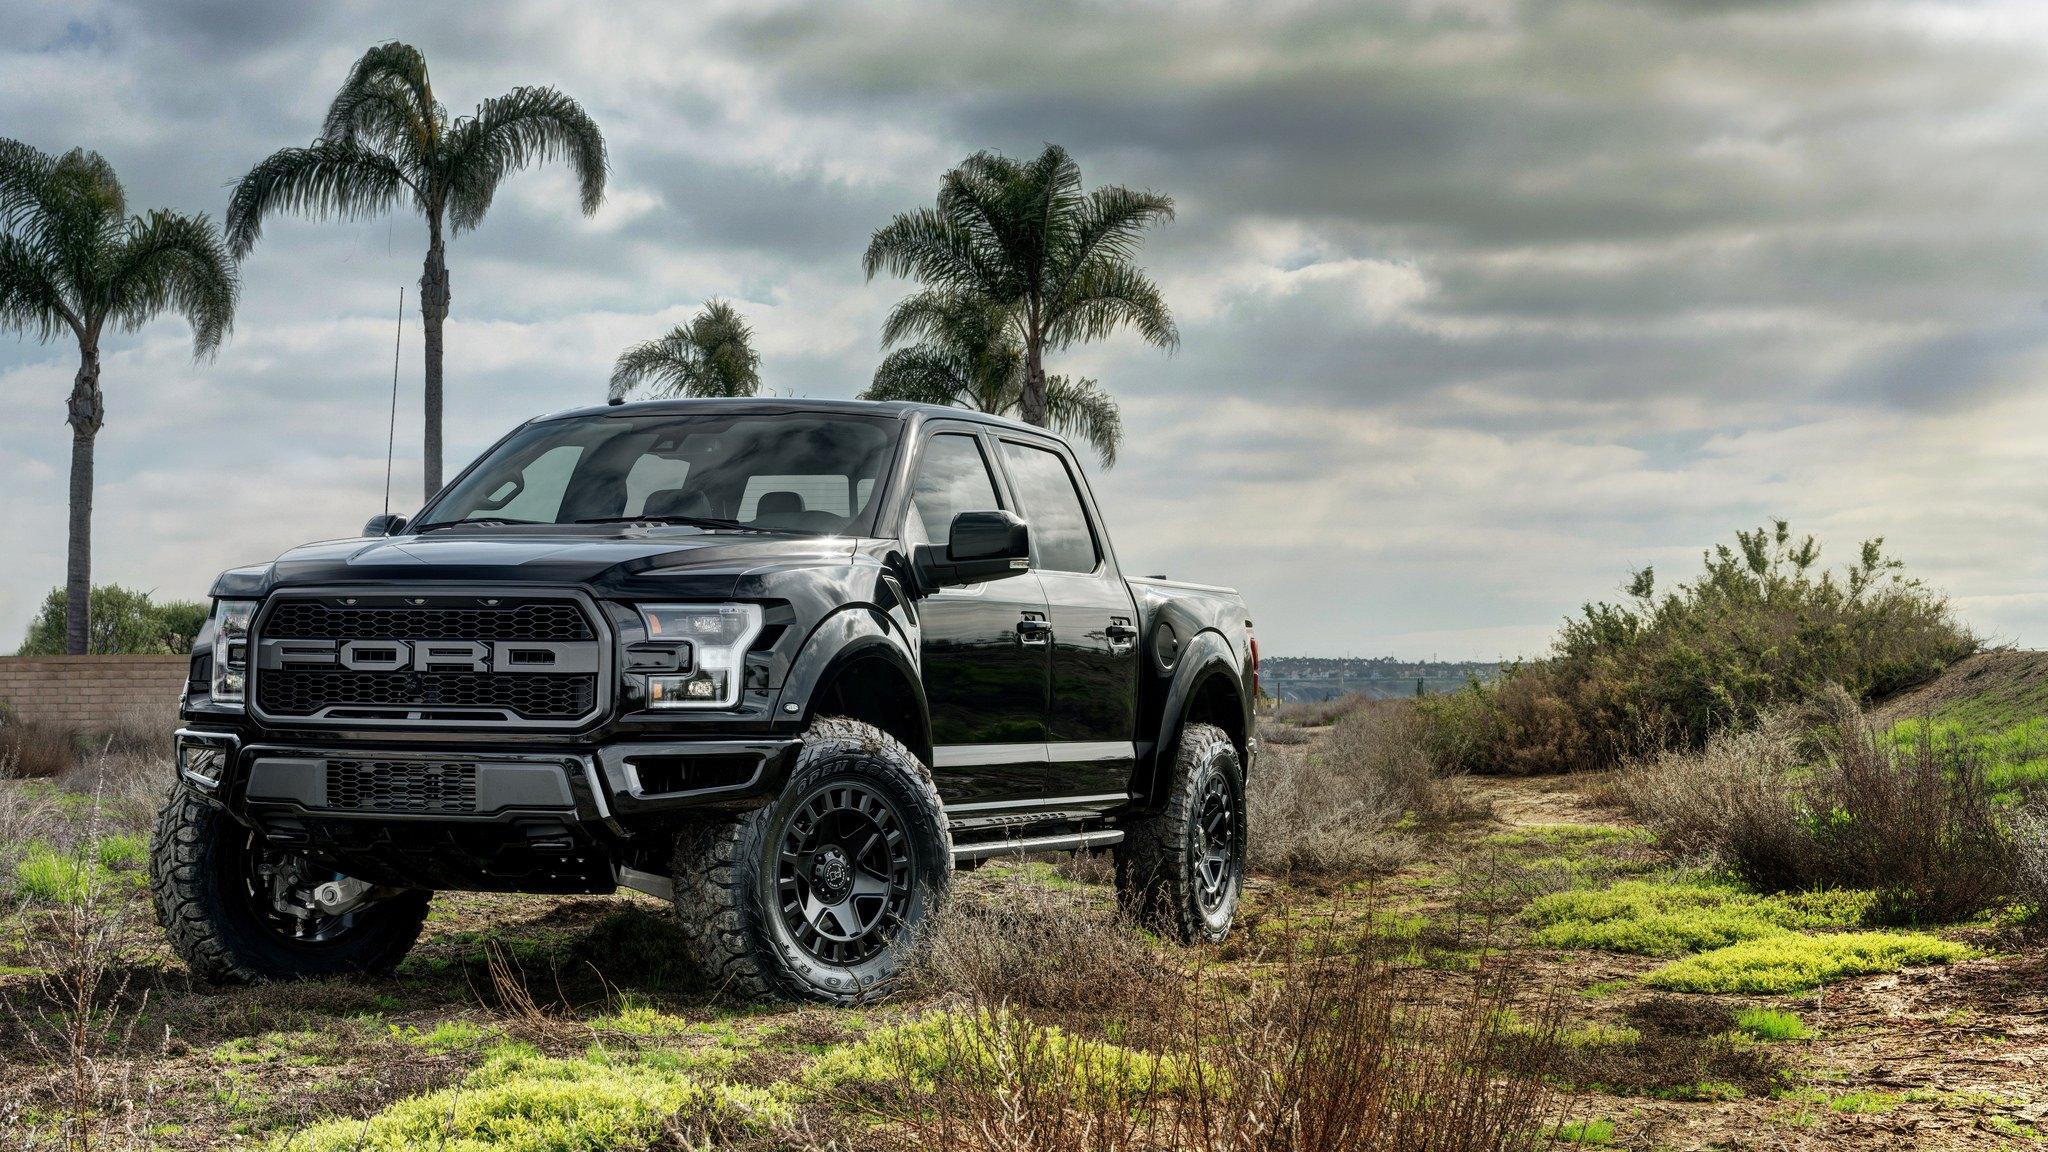 Black Ford Raptor Off Road 2048x1152 Wallpaper Teahub Io